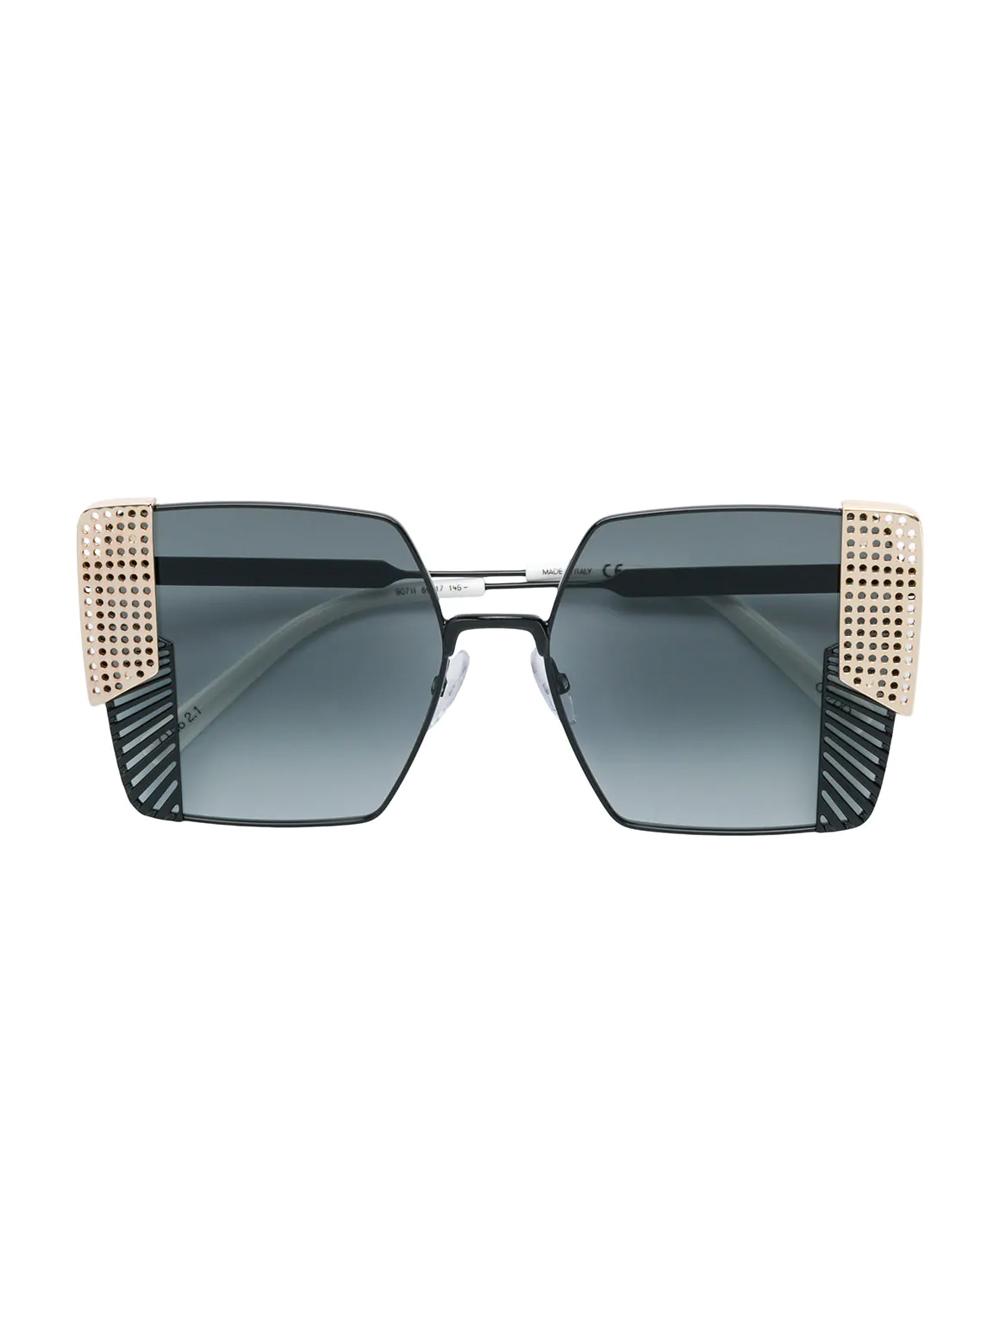 OXYDO oversized square sunglasses